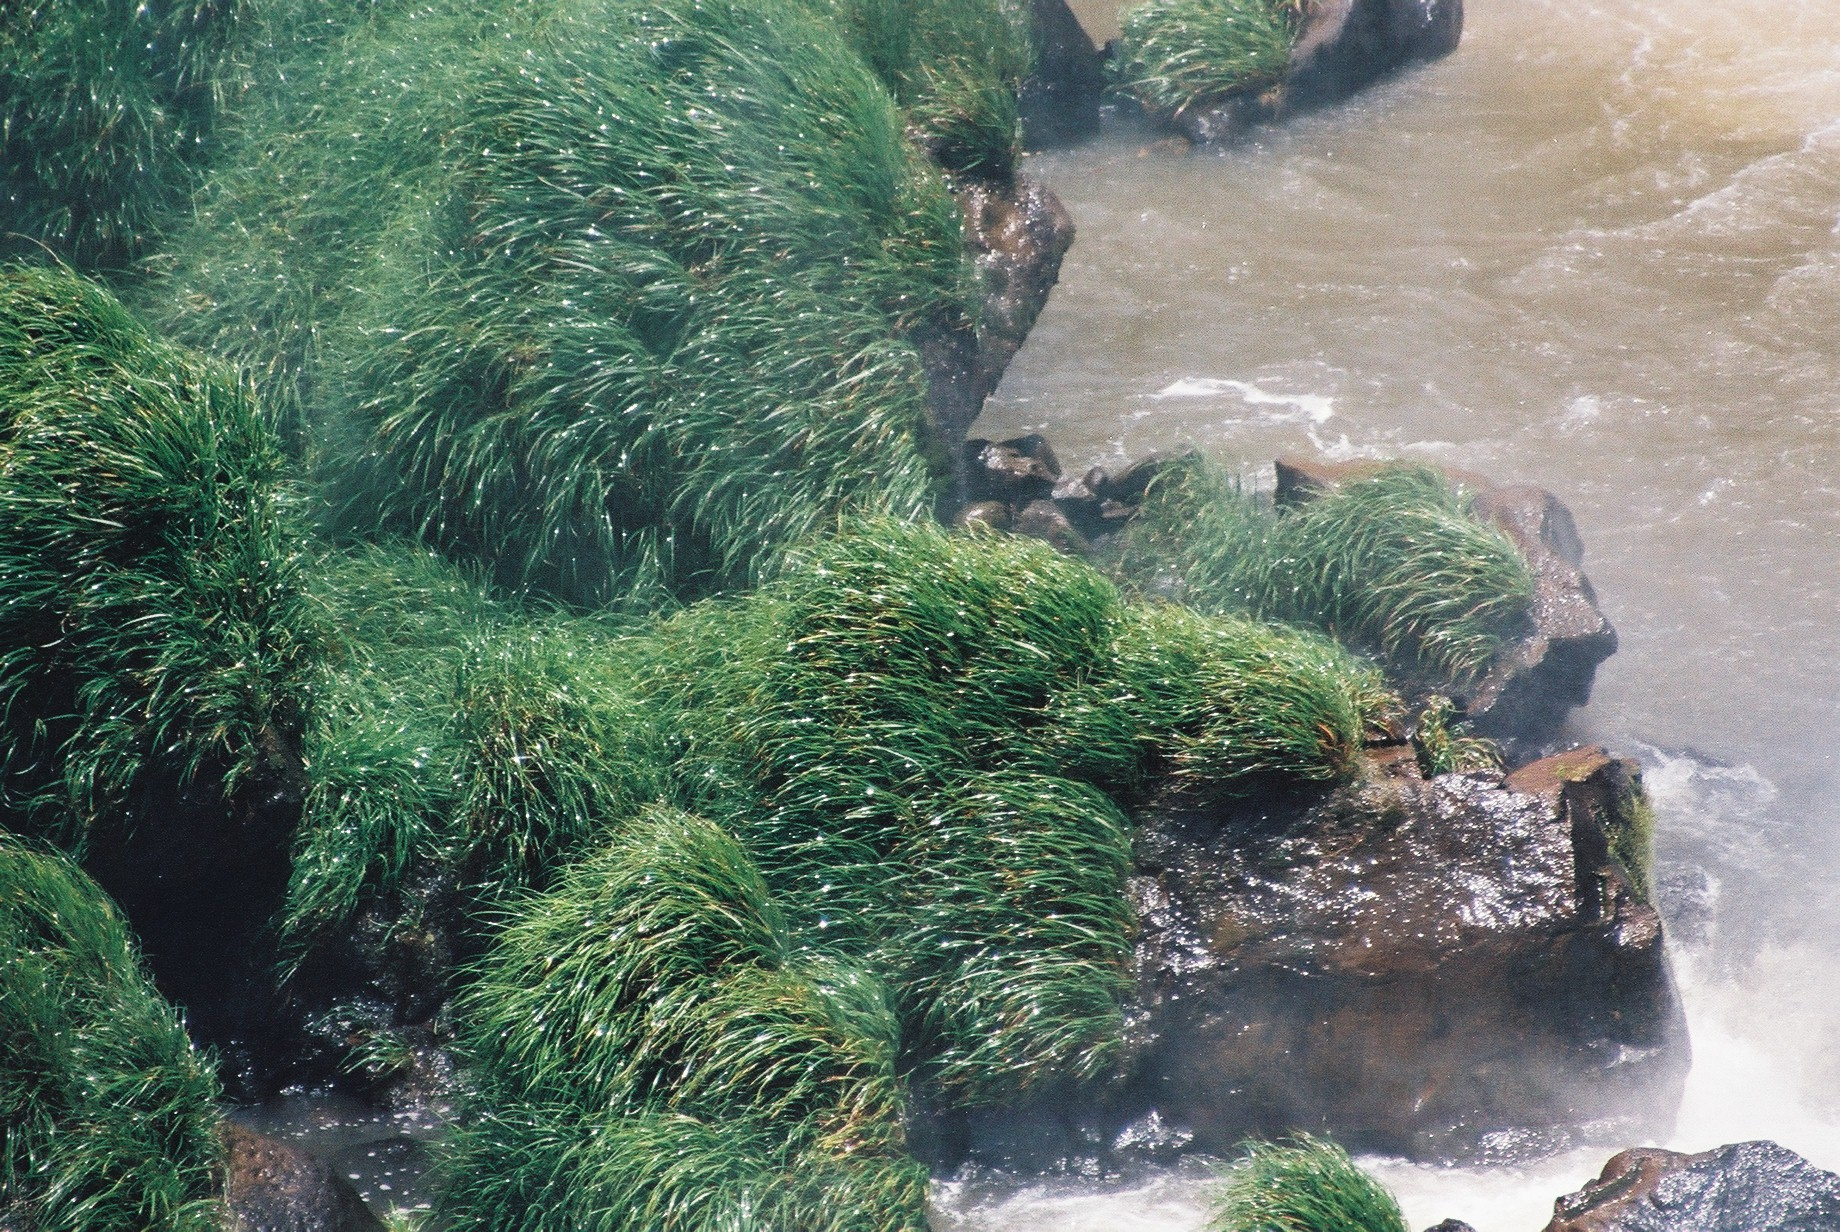 Plants in the Spray, Iguazu.JPG